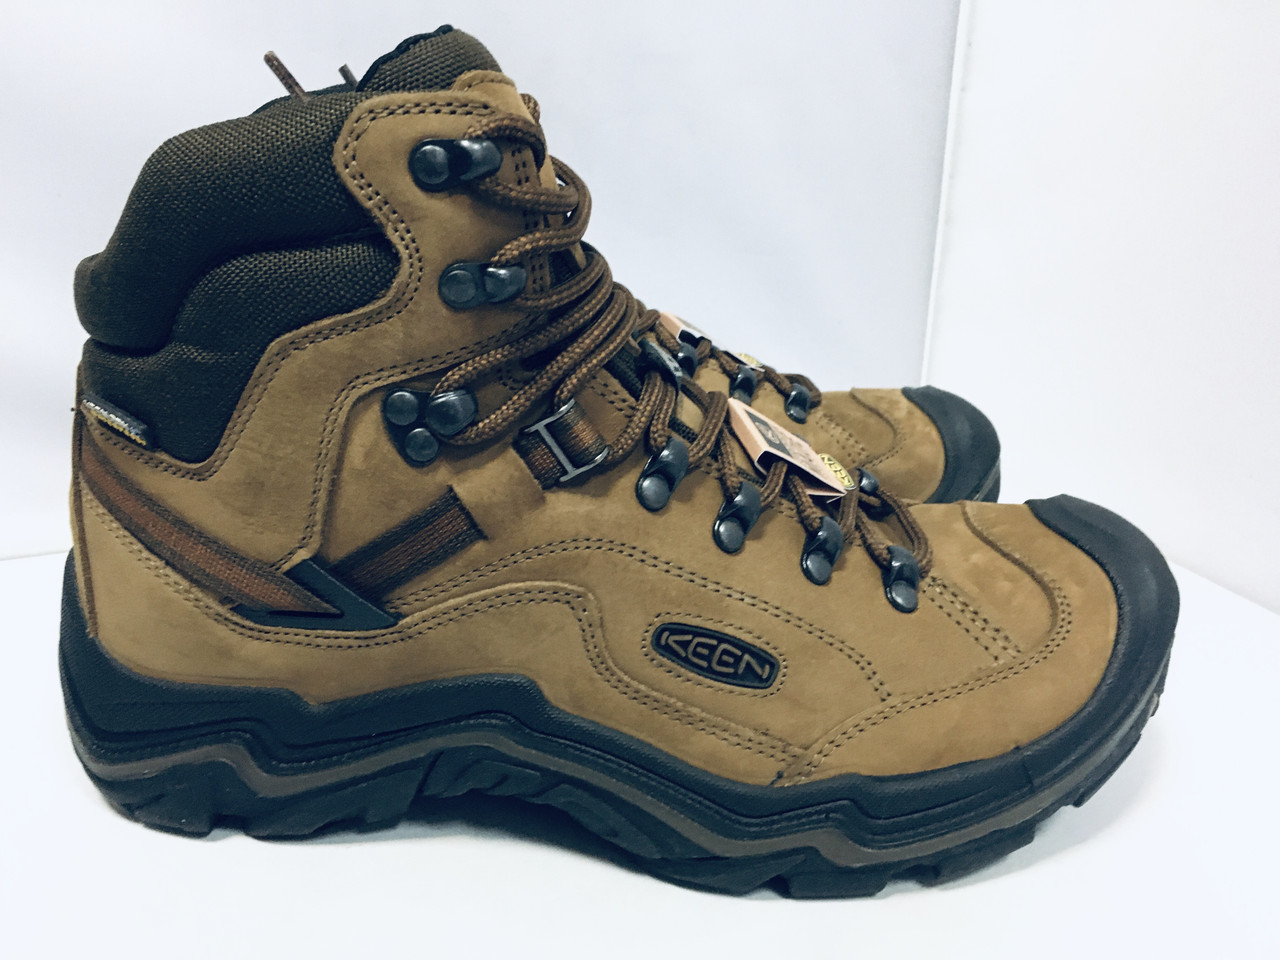 Мужские зимние ботинки Keen, 42 размер